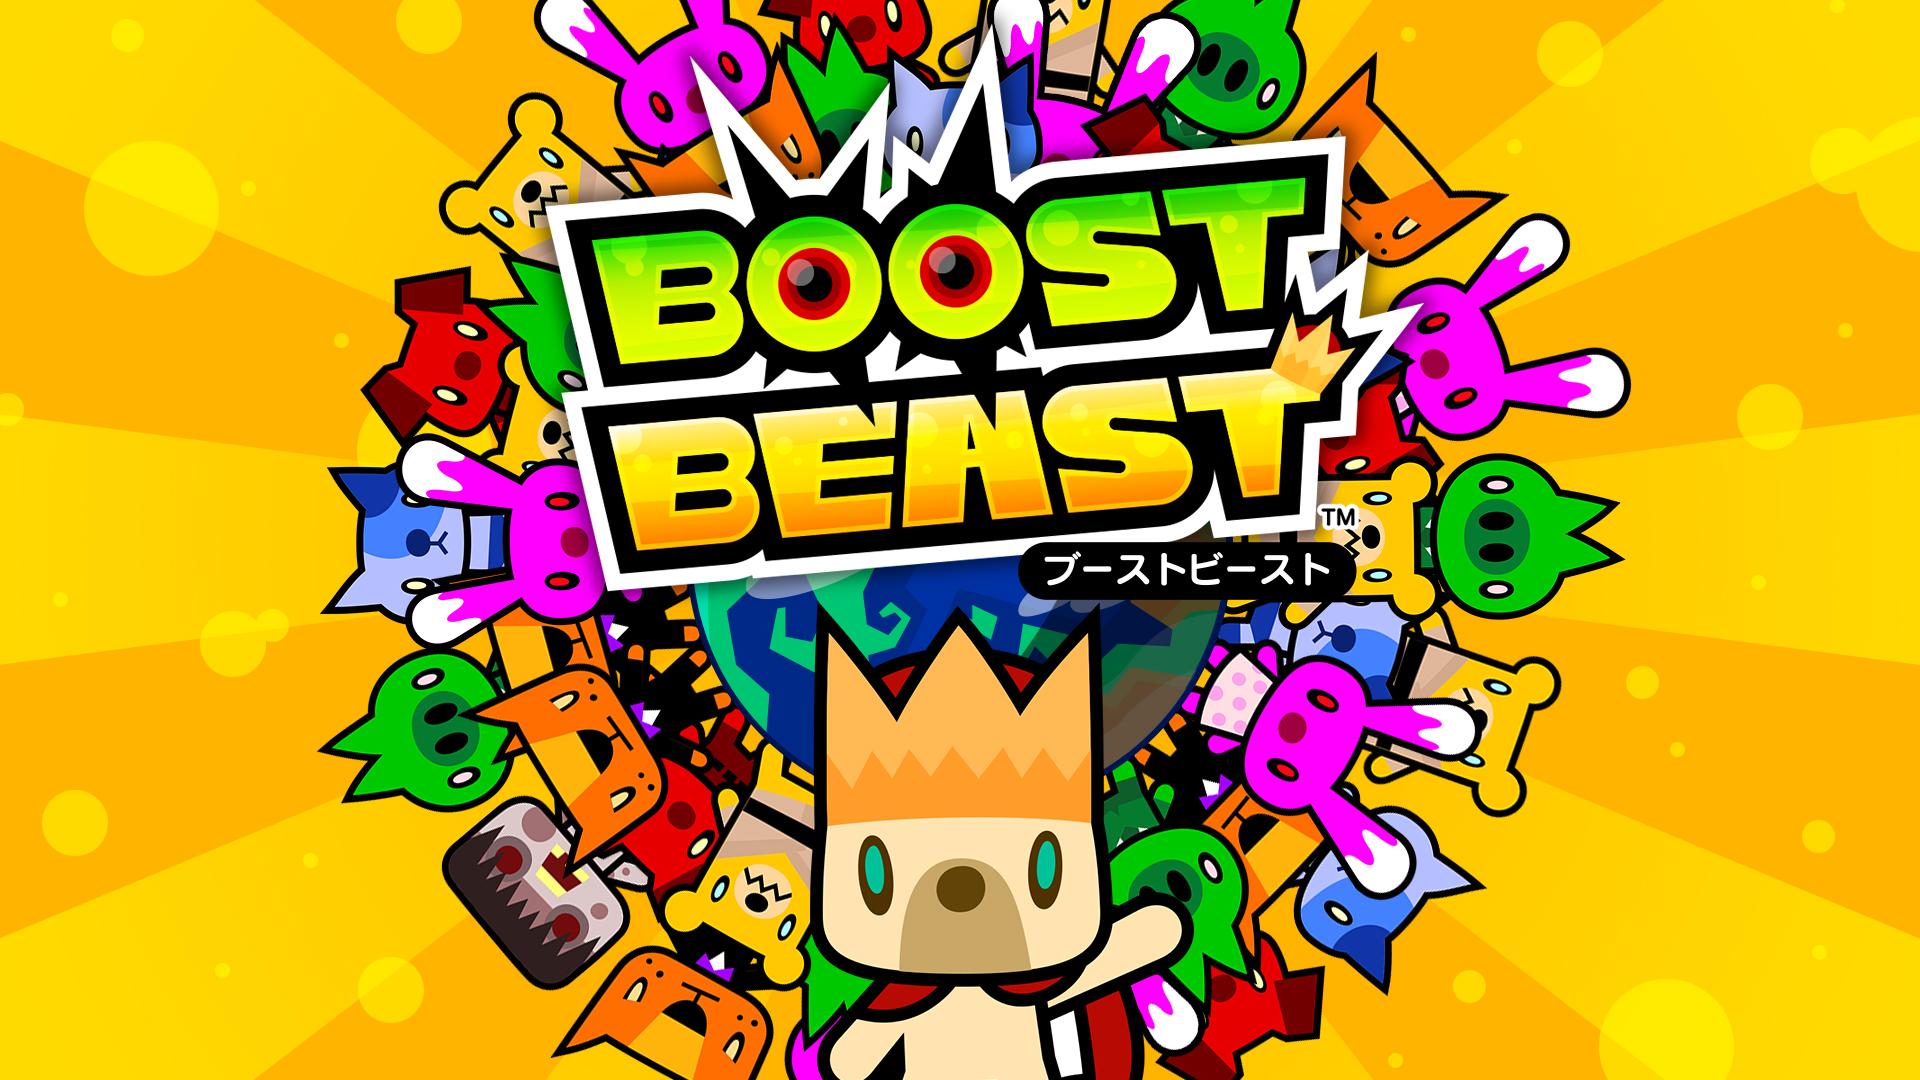 boost beast_Boost Beast footage - Nintendo Everything